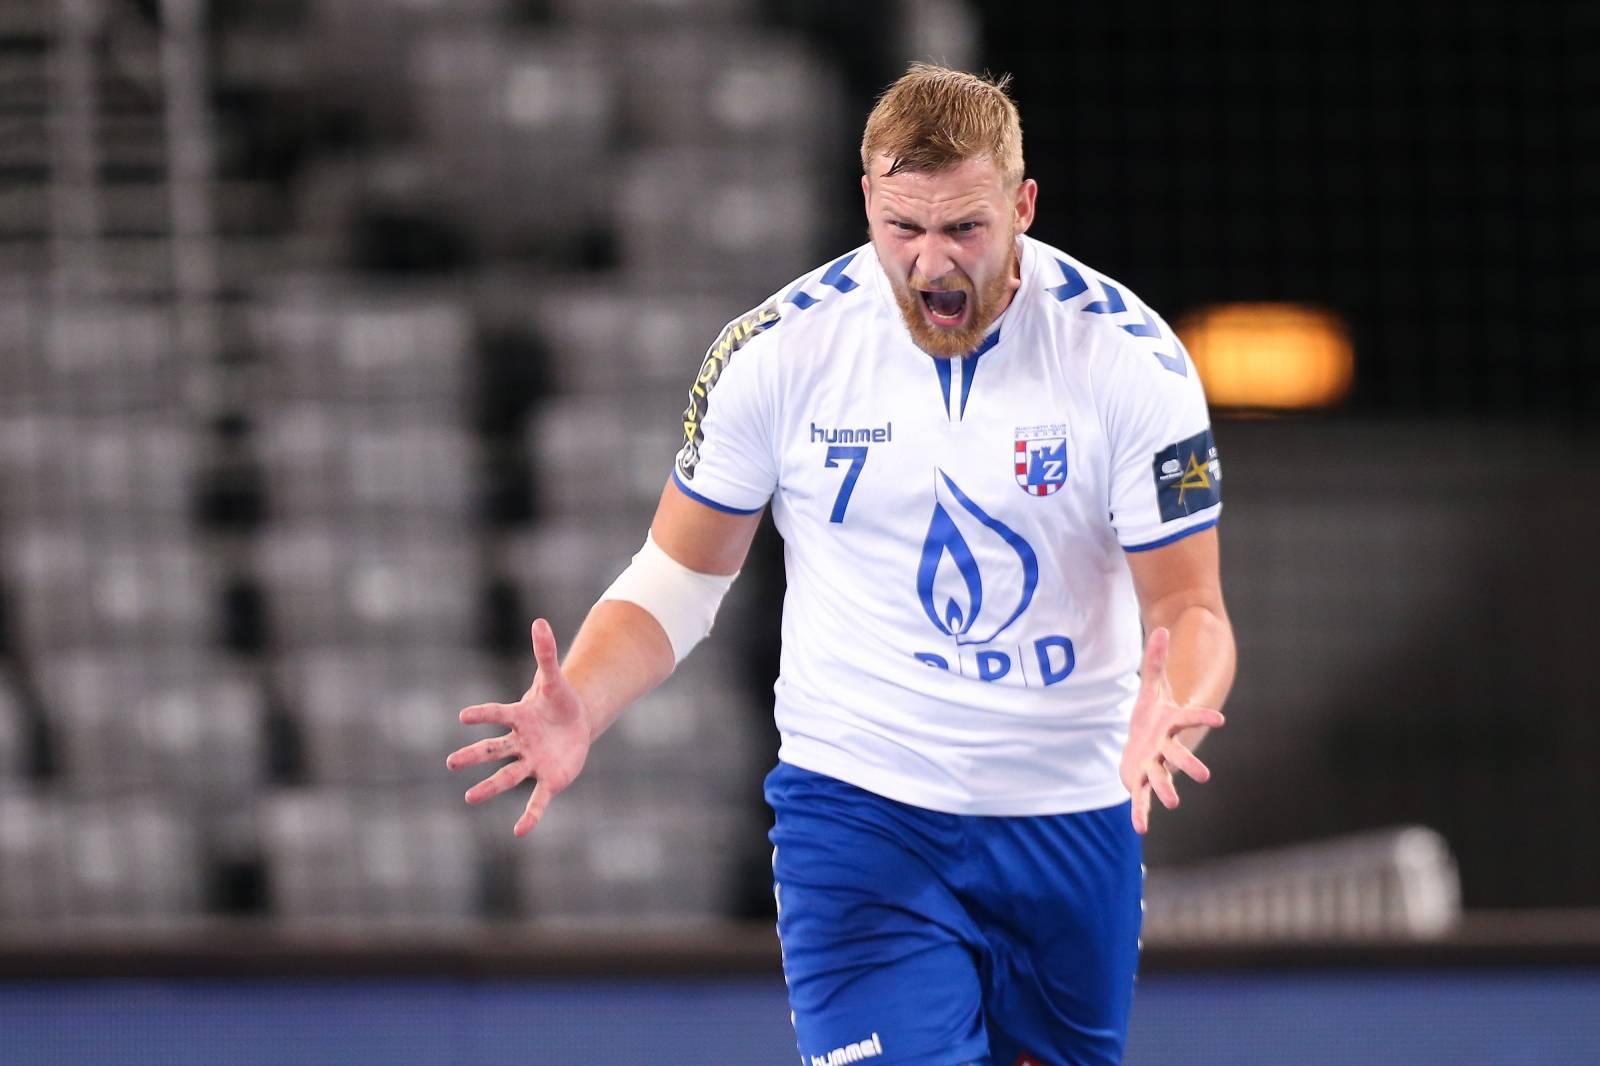 U susretu 3. kola rukometne Lige prvaka PPD Zagreb izgubio od Aalborg Handbolda